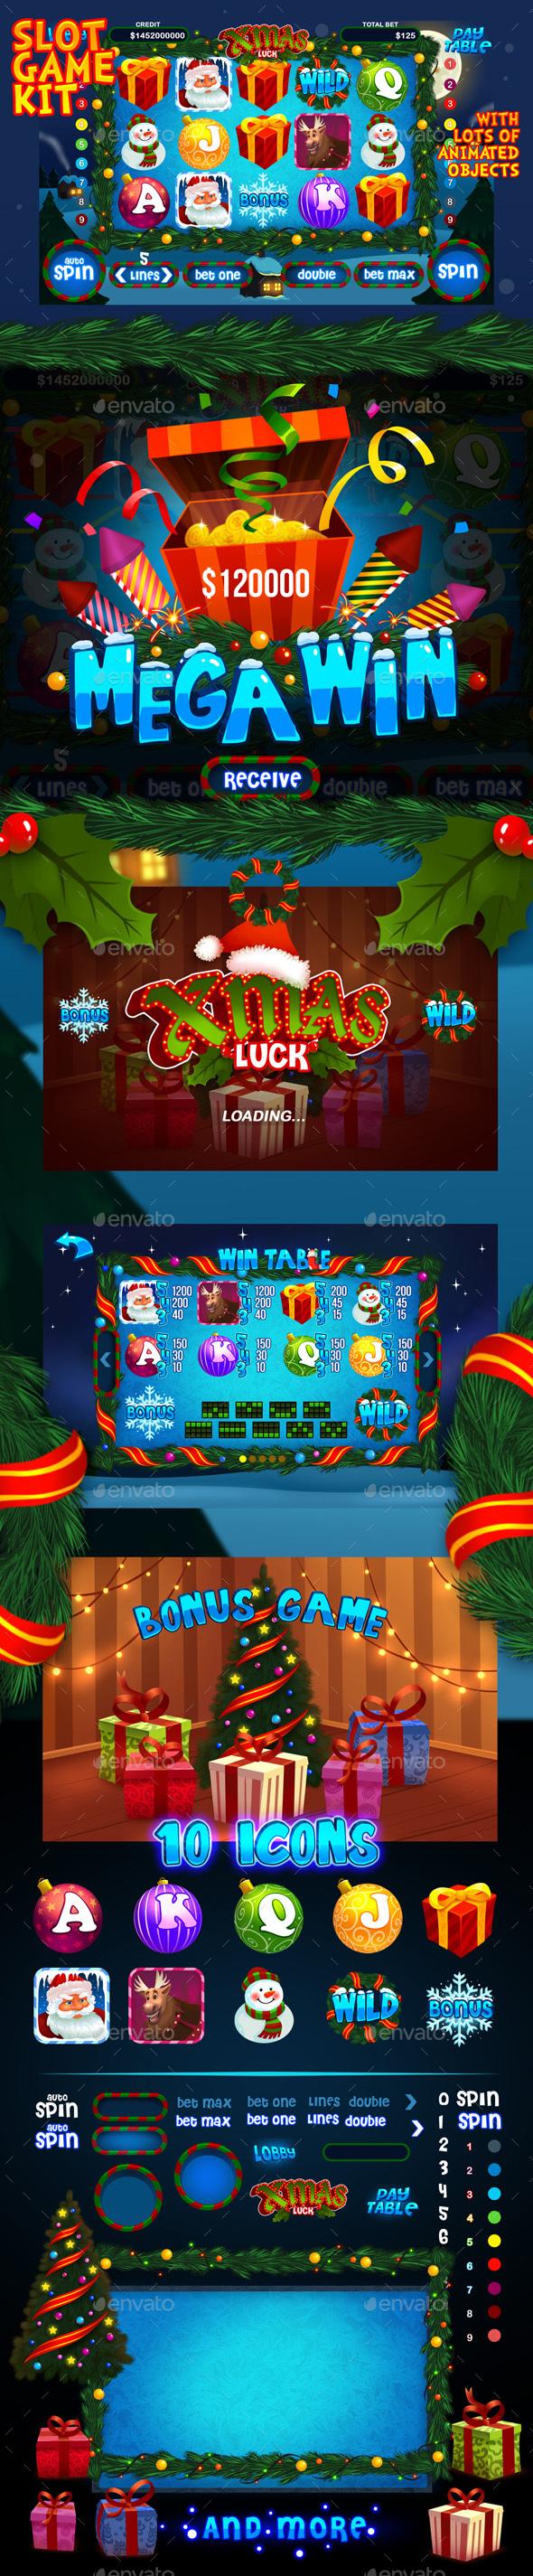 Xmas luck slot game kit (Game Kits)